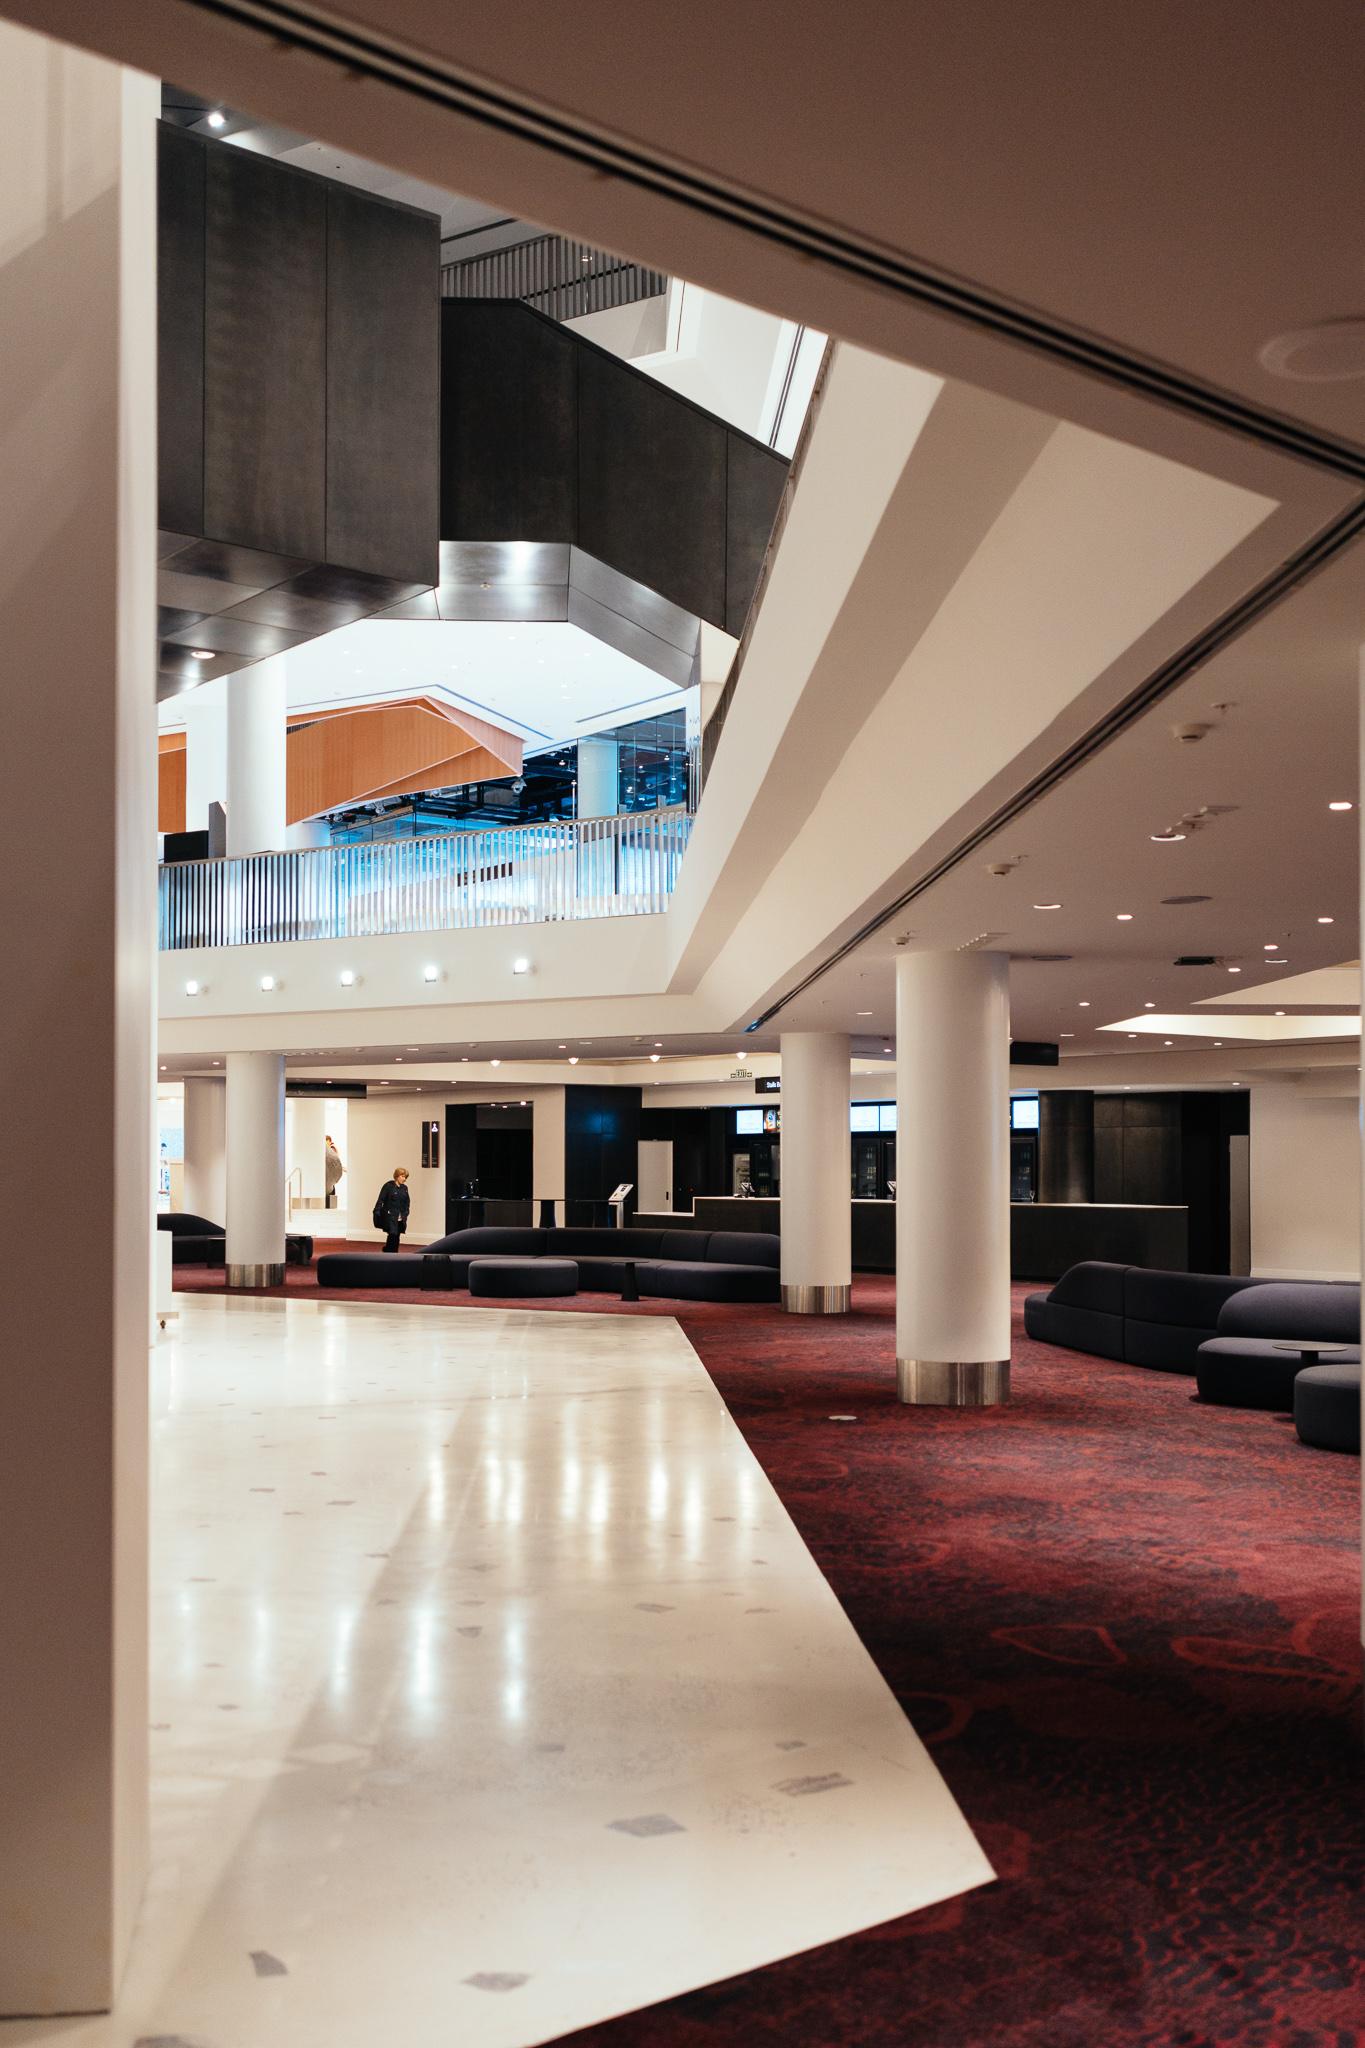 https://rfacdn.nz/conventions/assets/media/aotea-centre-level-2-stalls-foyer.jpg